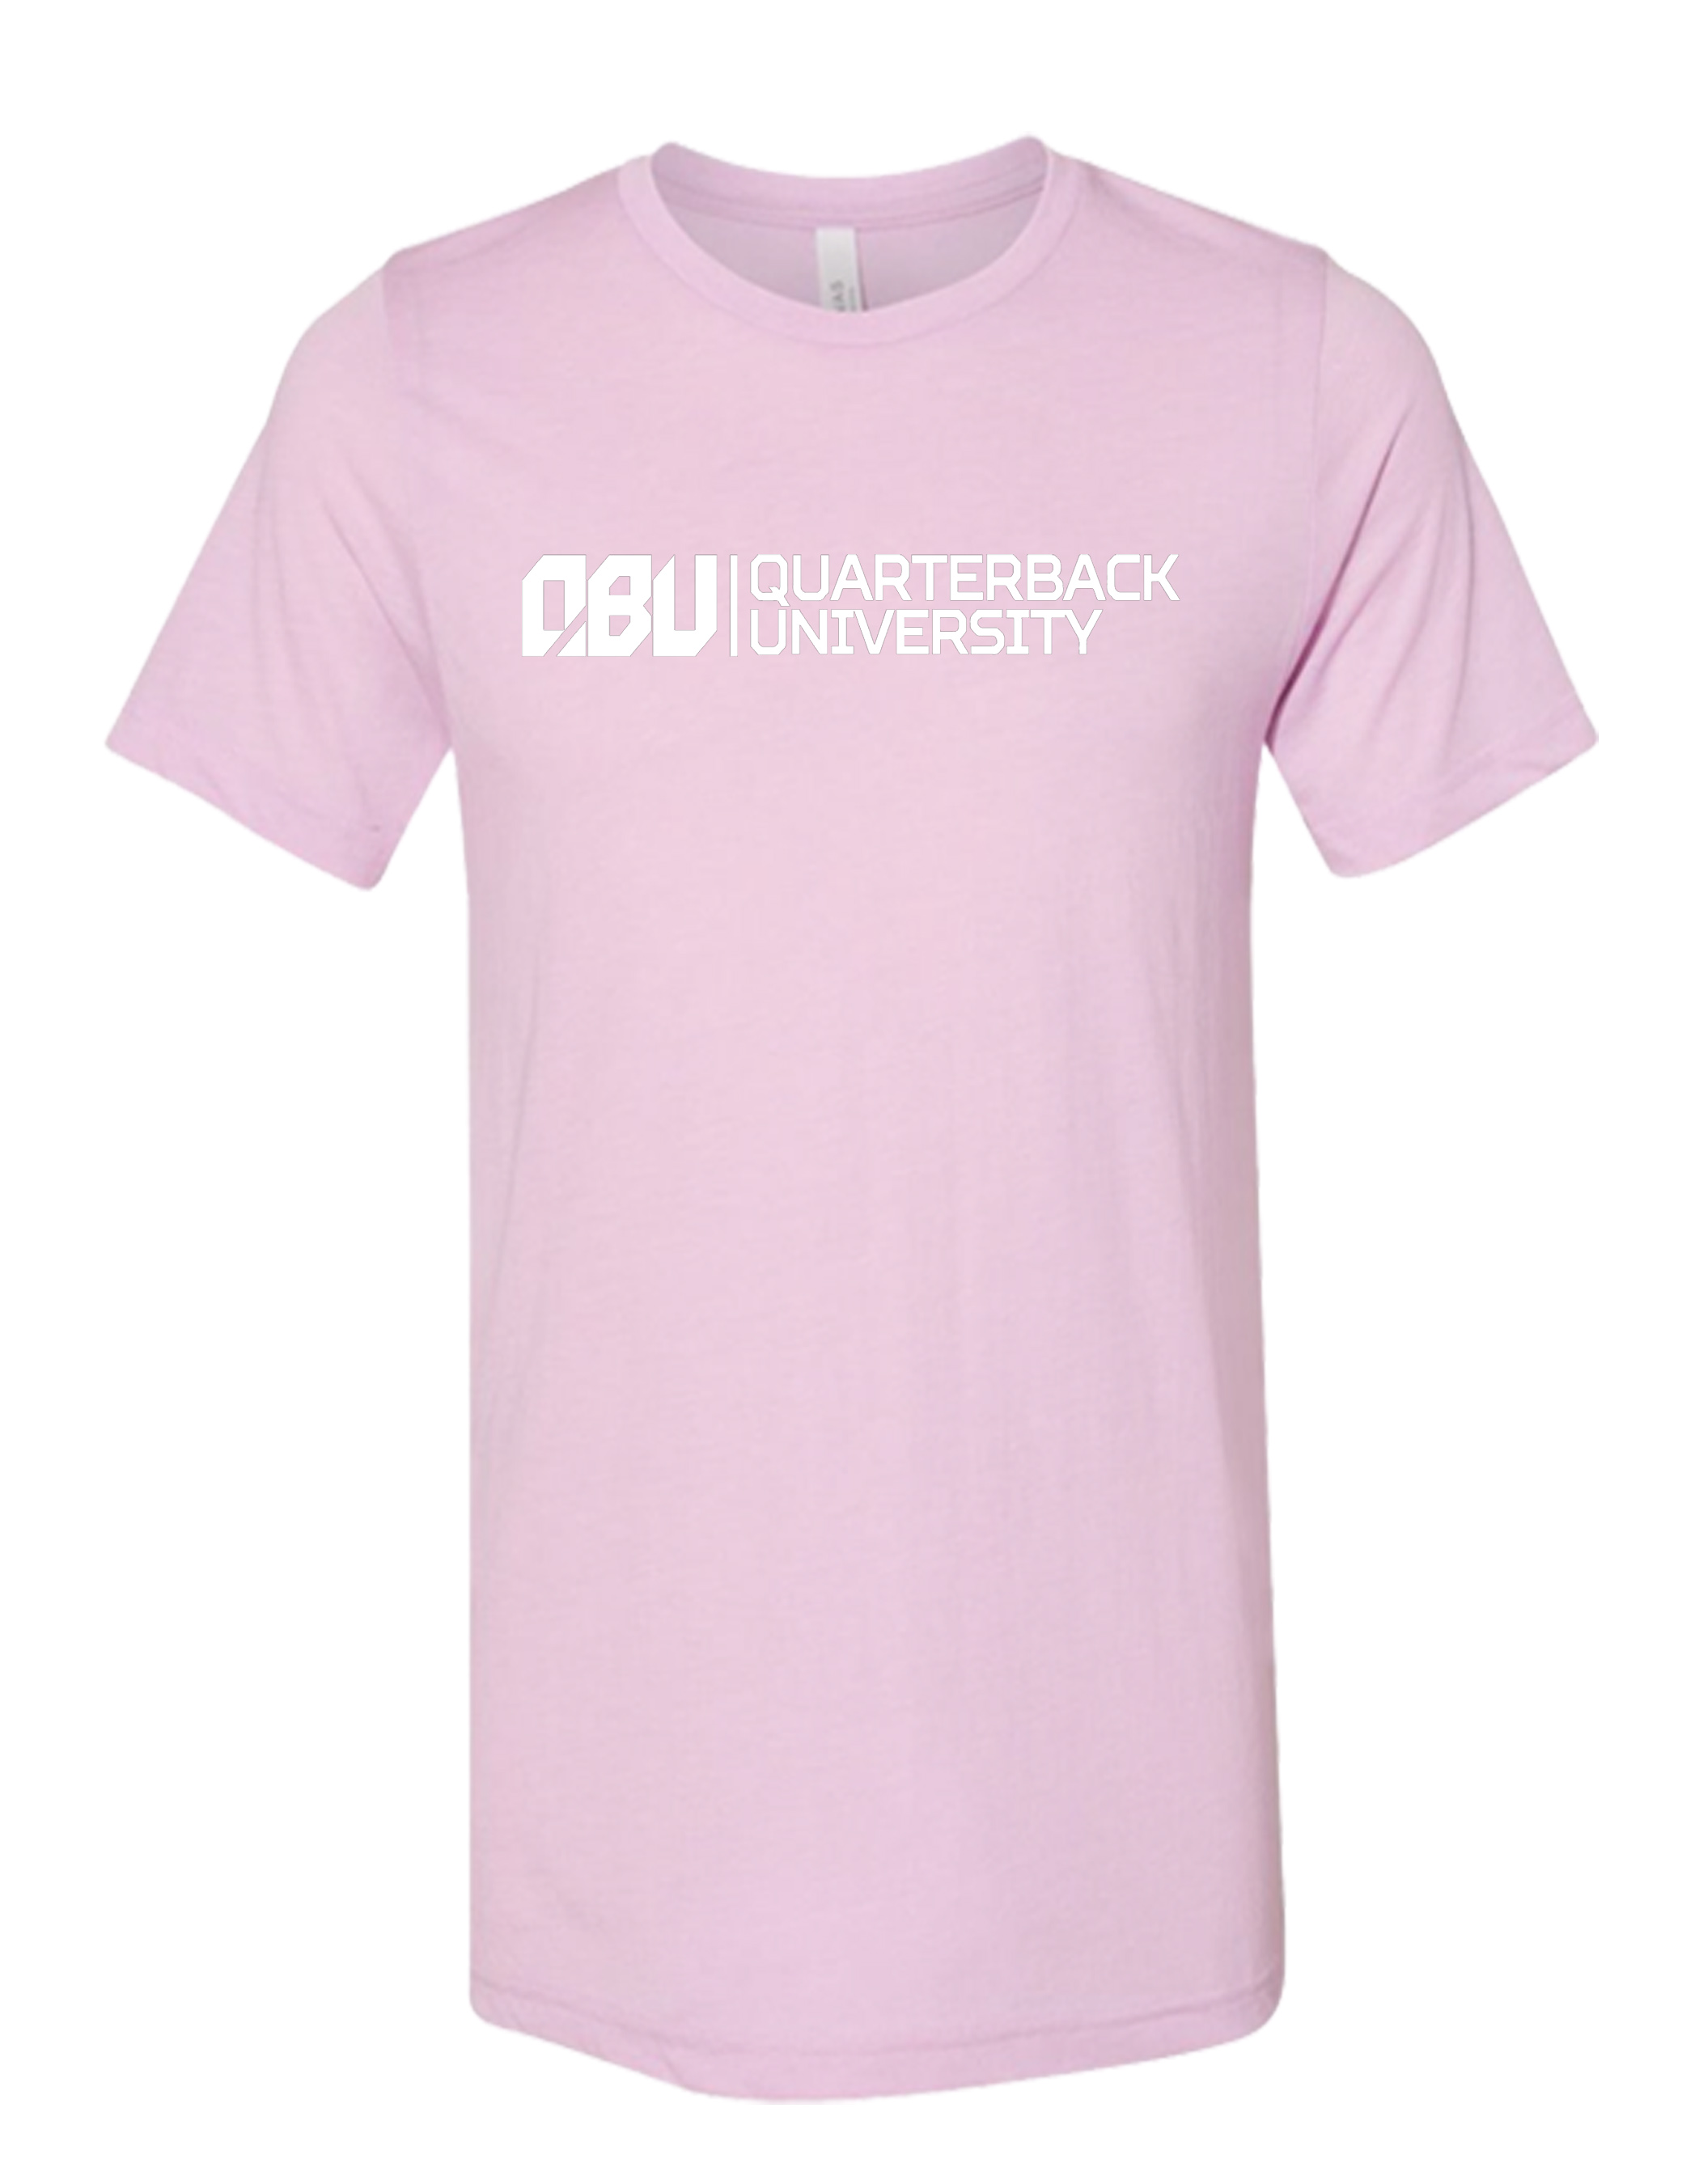 Quarterback University Tee Pink